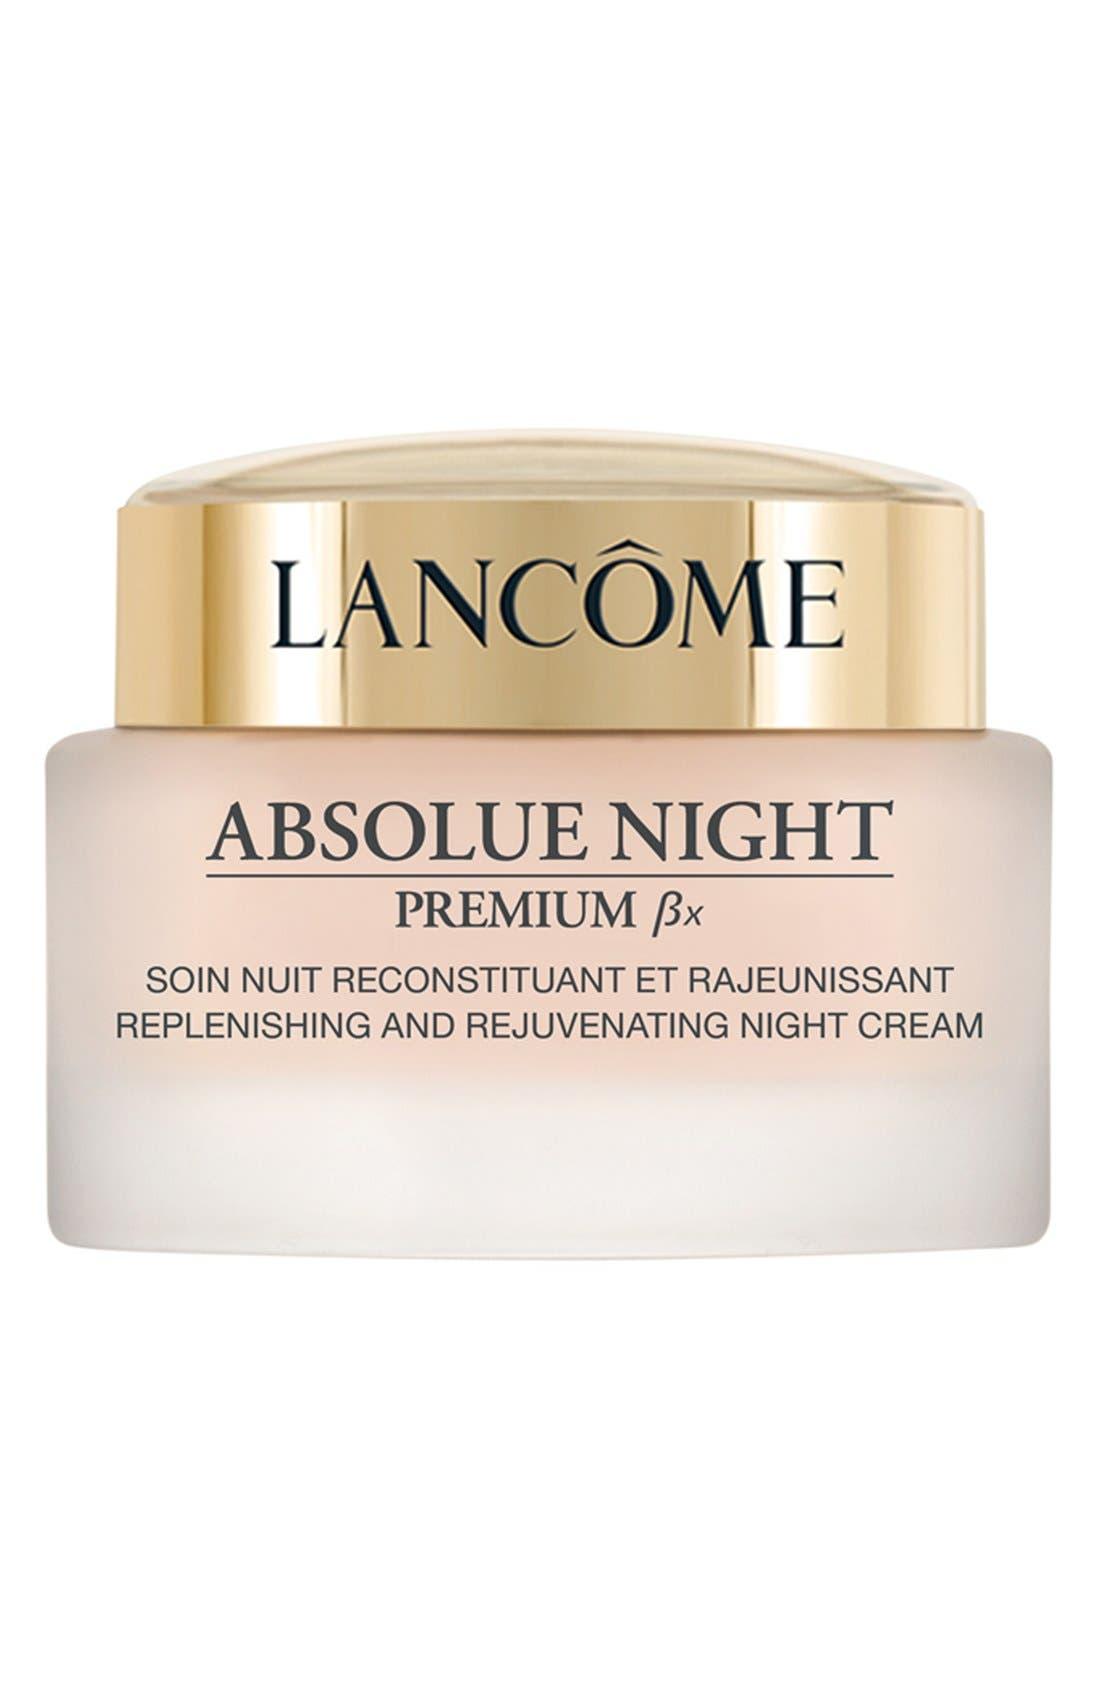 Lancome Absolue Premium Bx Night Recovery Night Cream